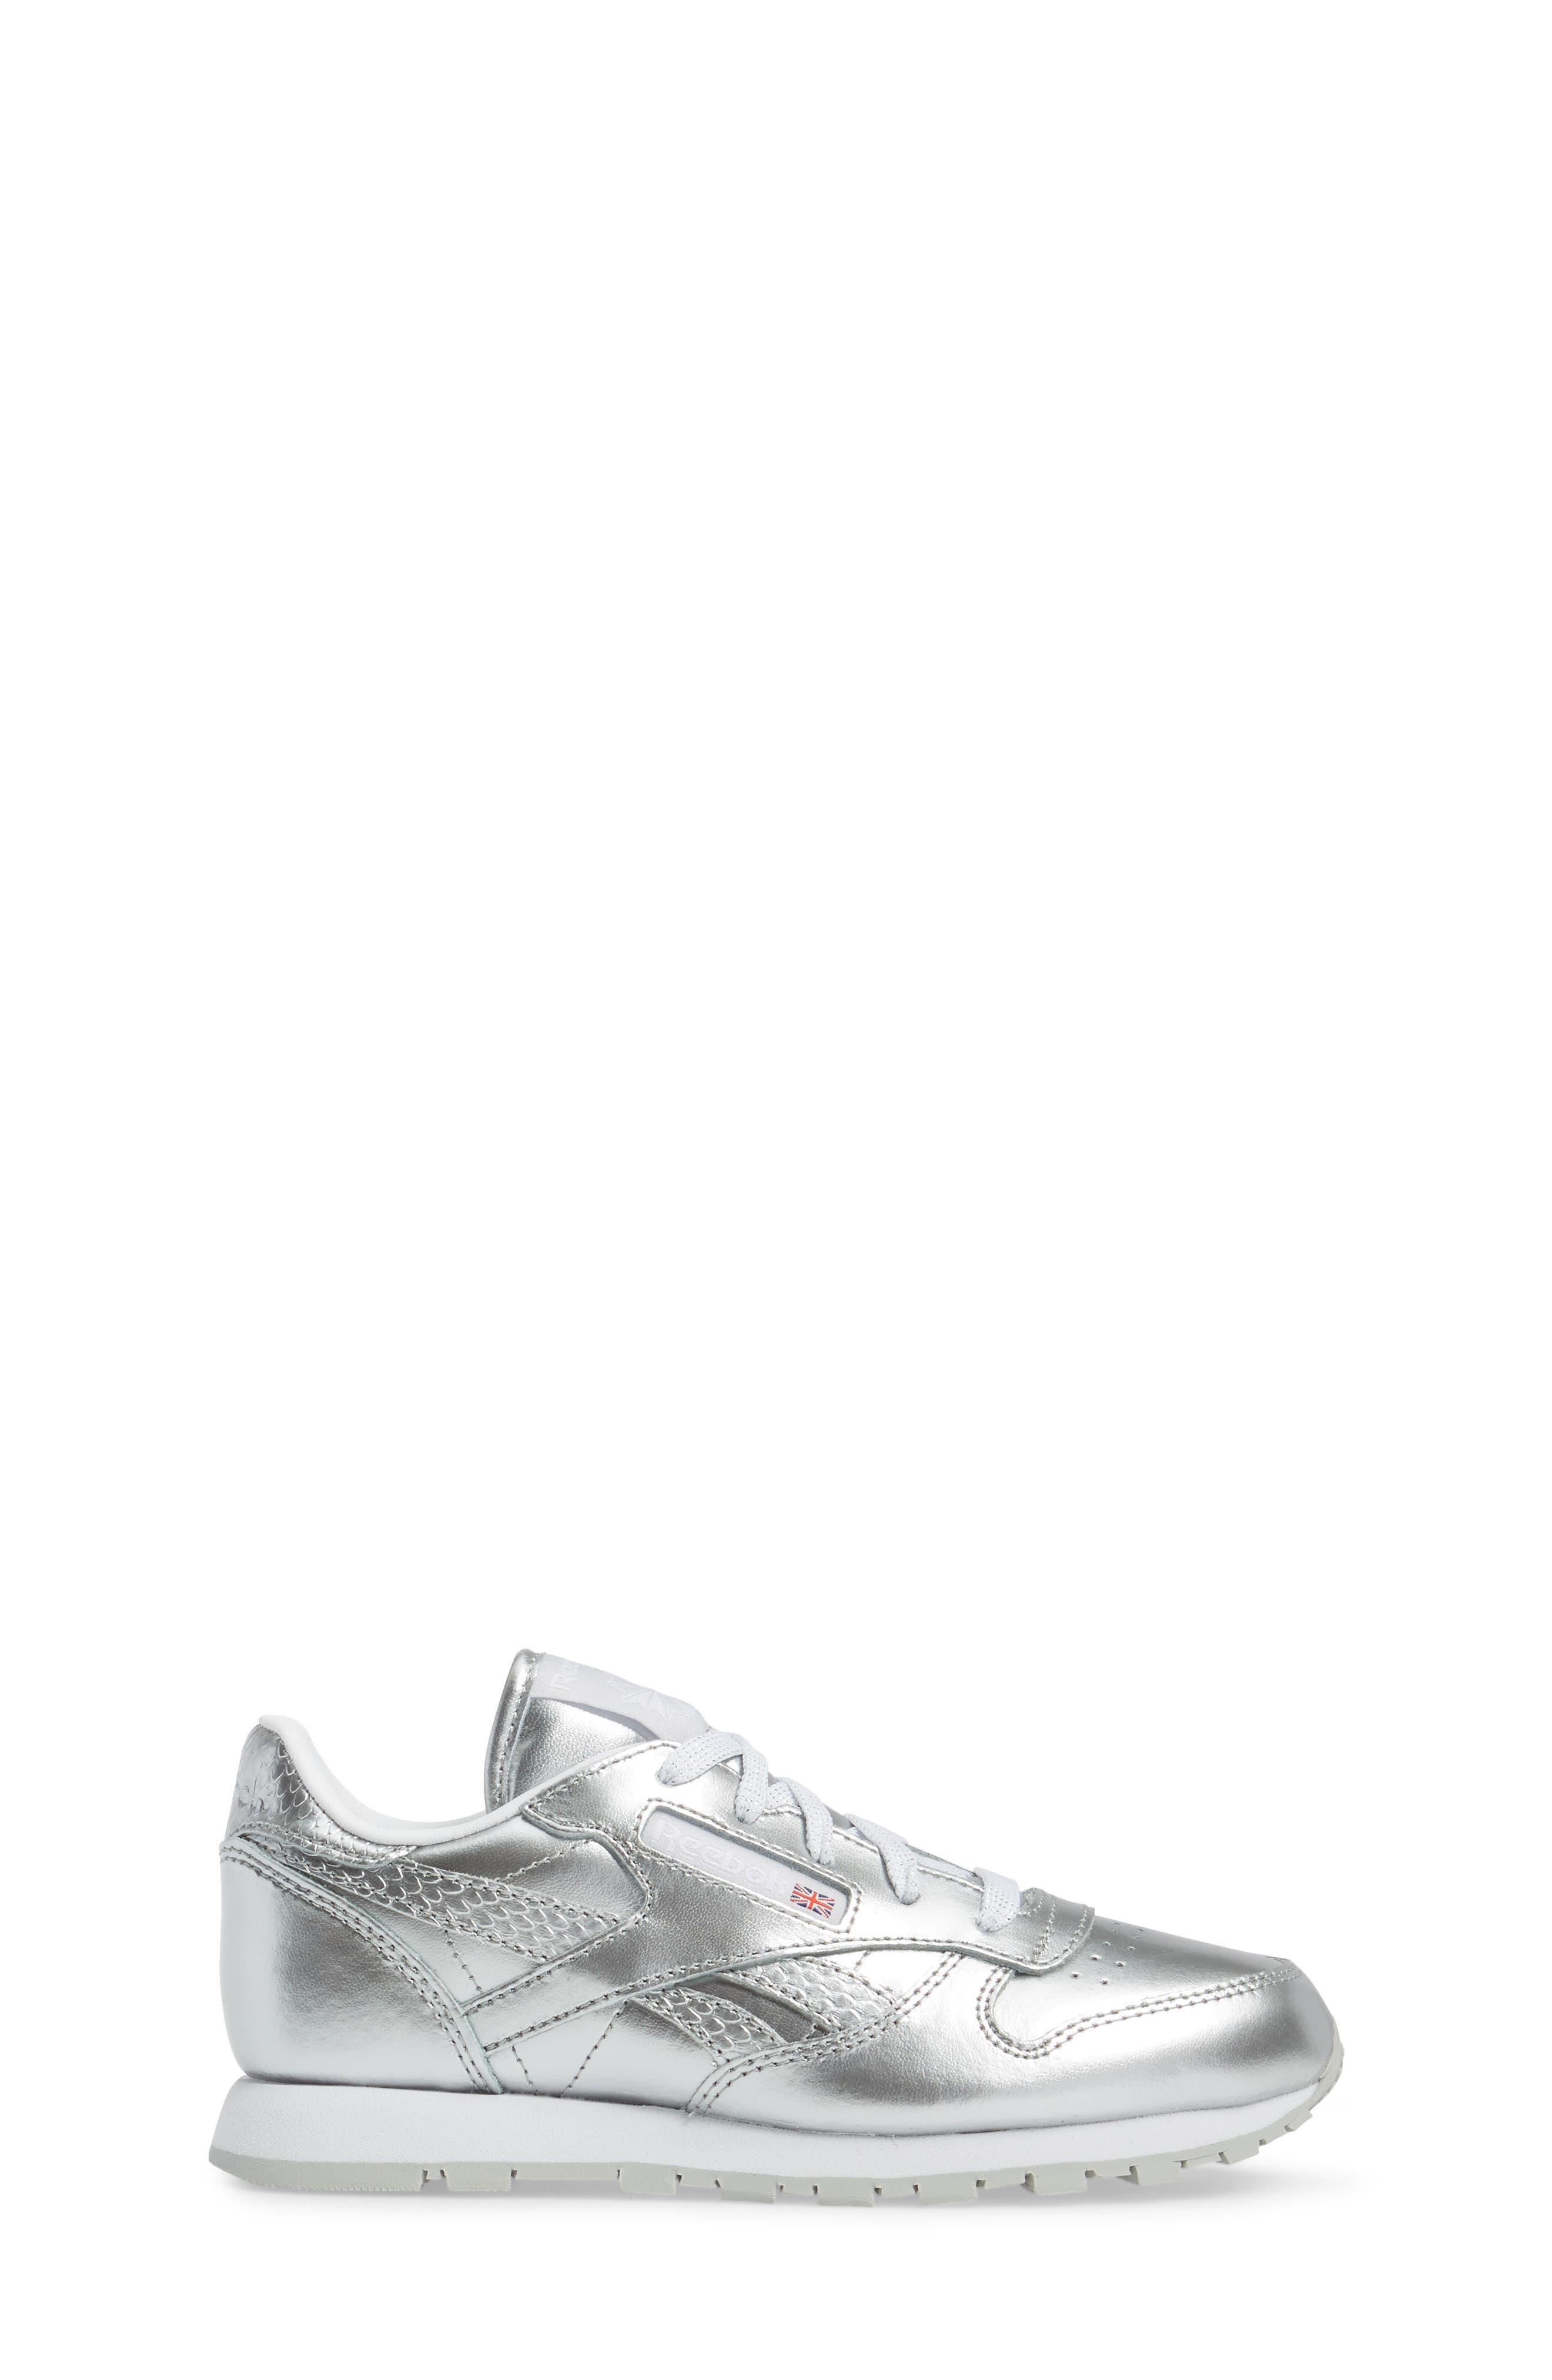 Alternate Image 3  - Reebok Classic Metallic Sneaker (Baby, Walker, Toddler, Little Kid & Big Kid)